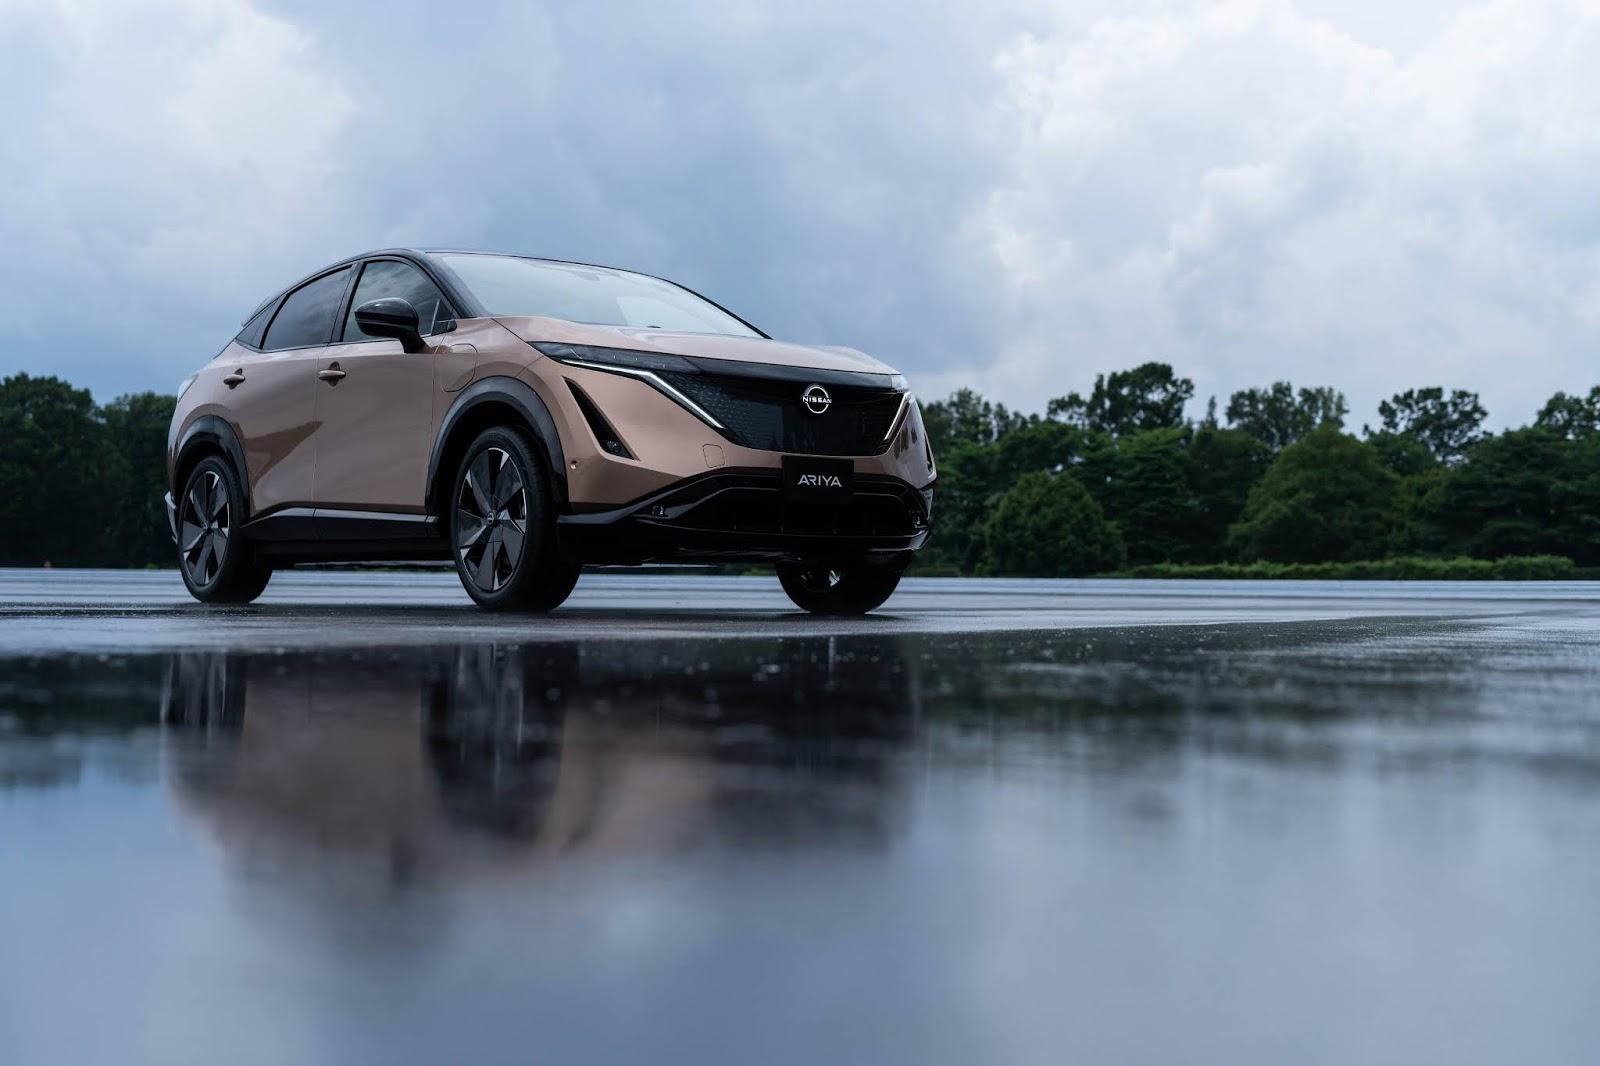 200715 01 001 Ariya : 'Ενα νέο κεφάλαιο στην ιστορία της Nissan